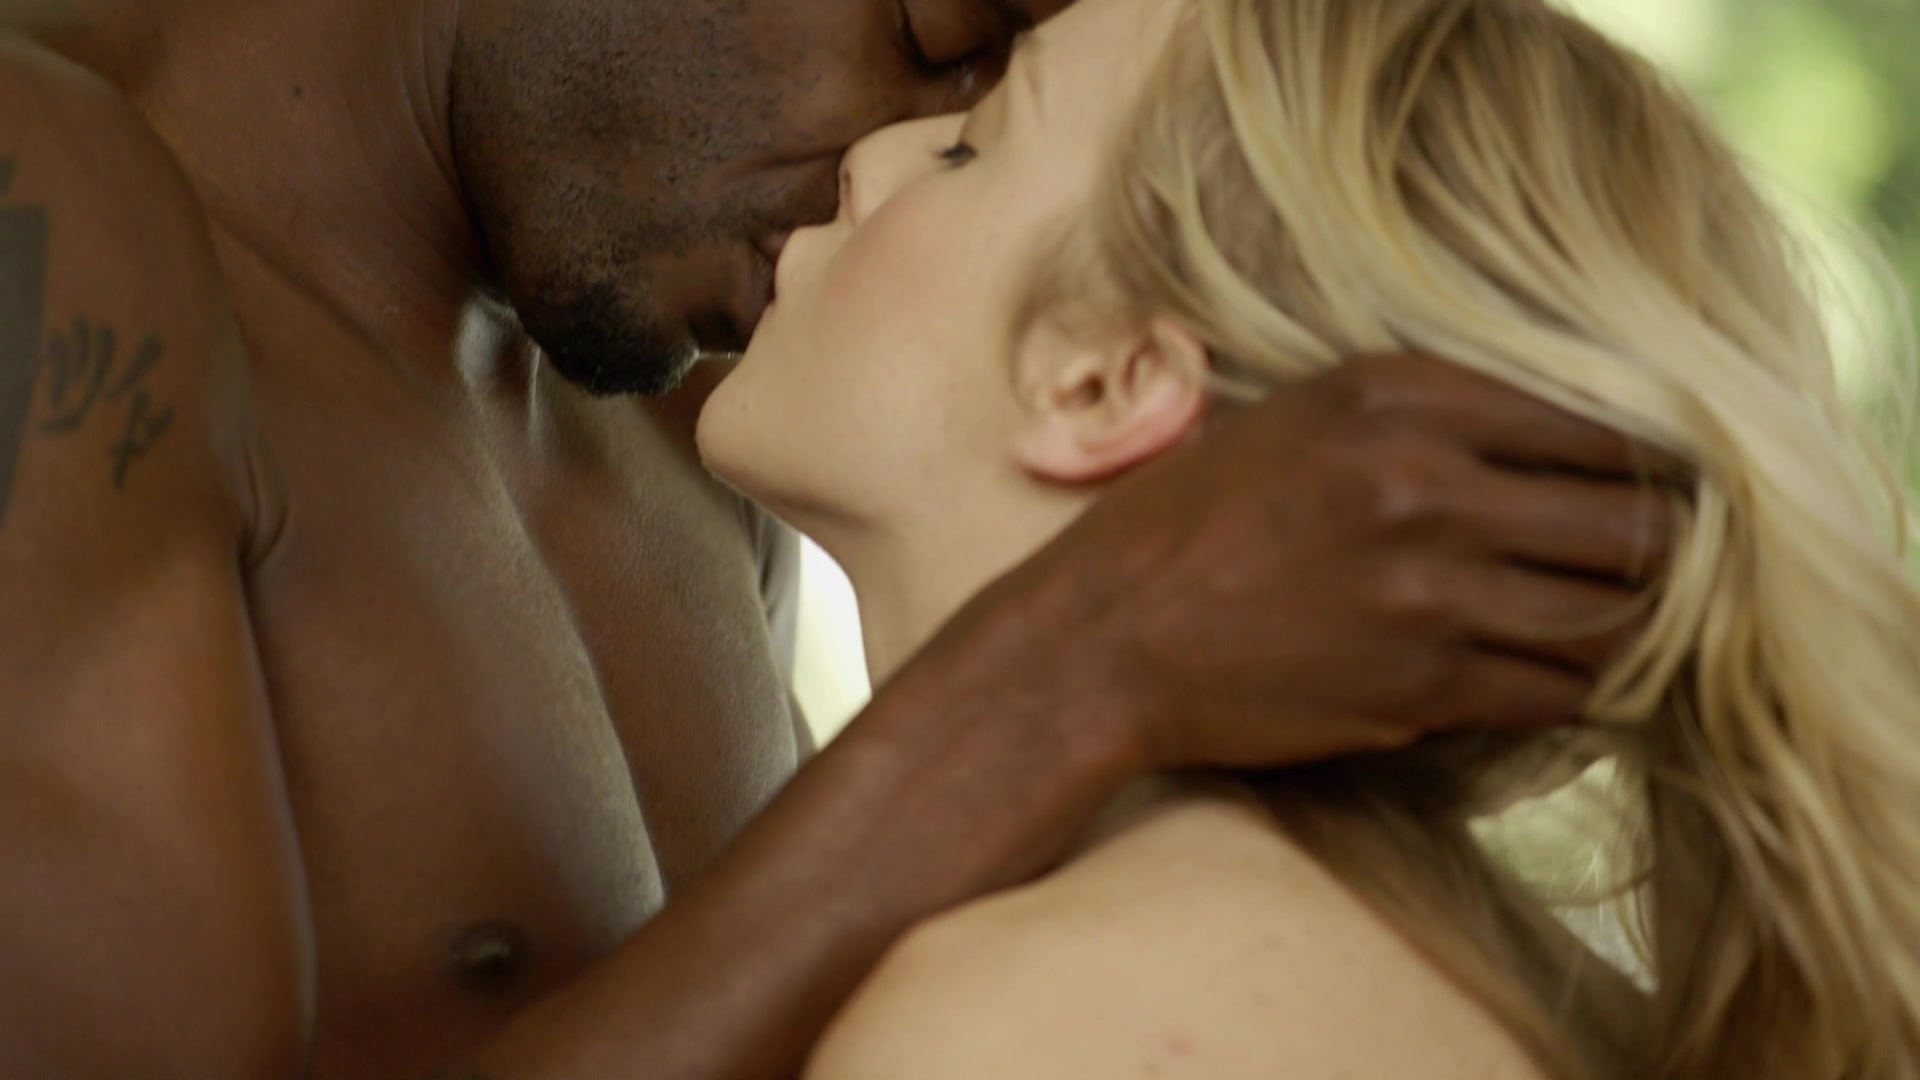 Free online videos interracial kissing #1